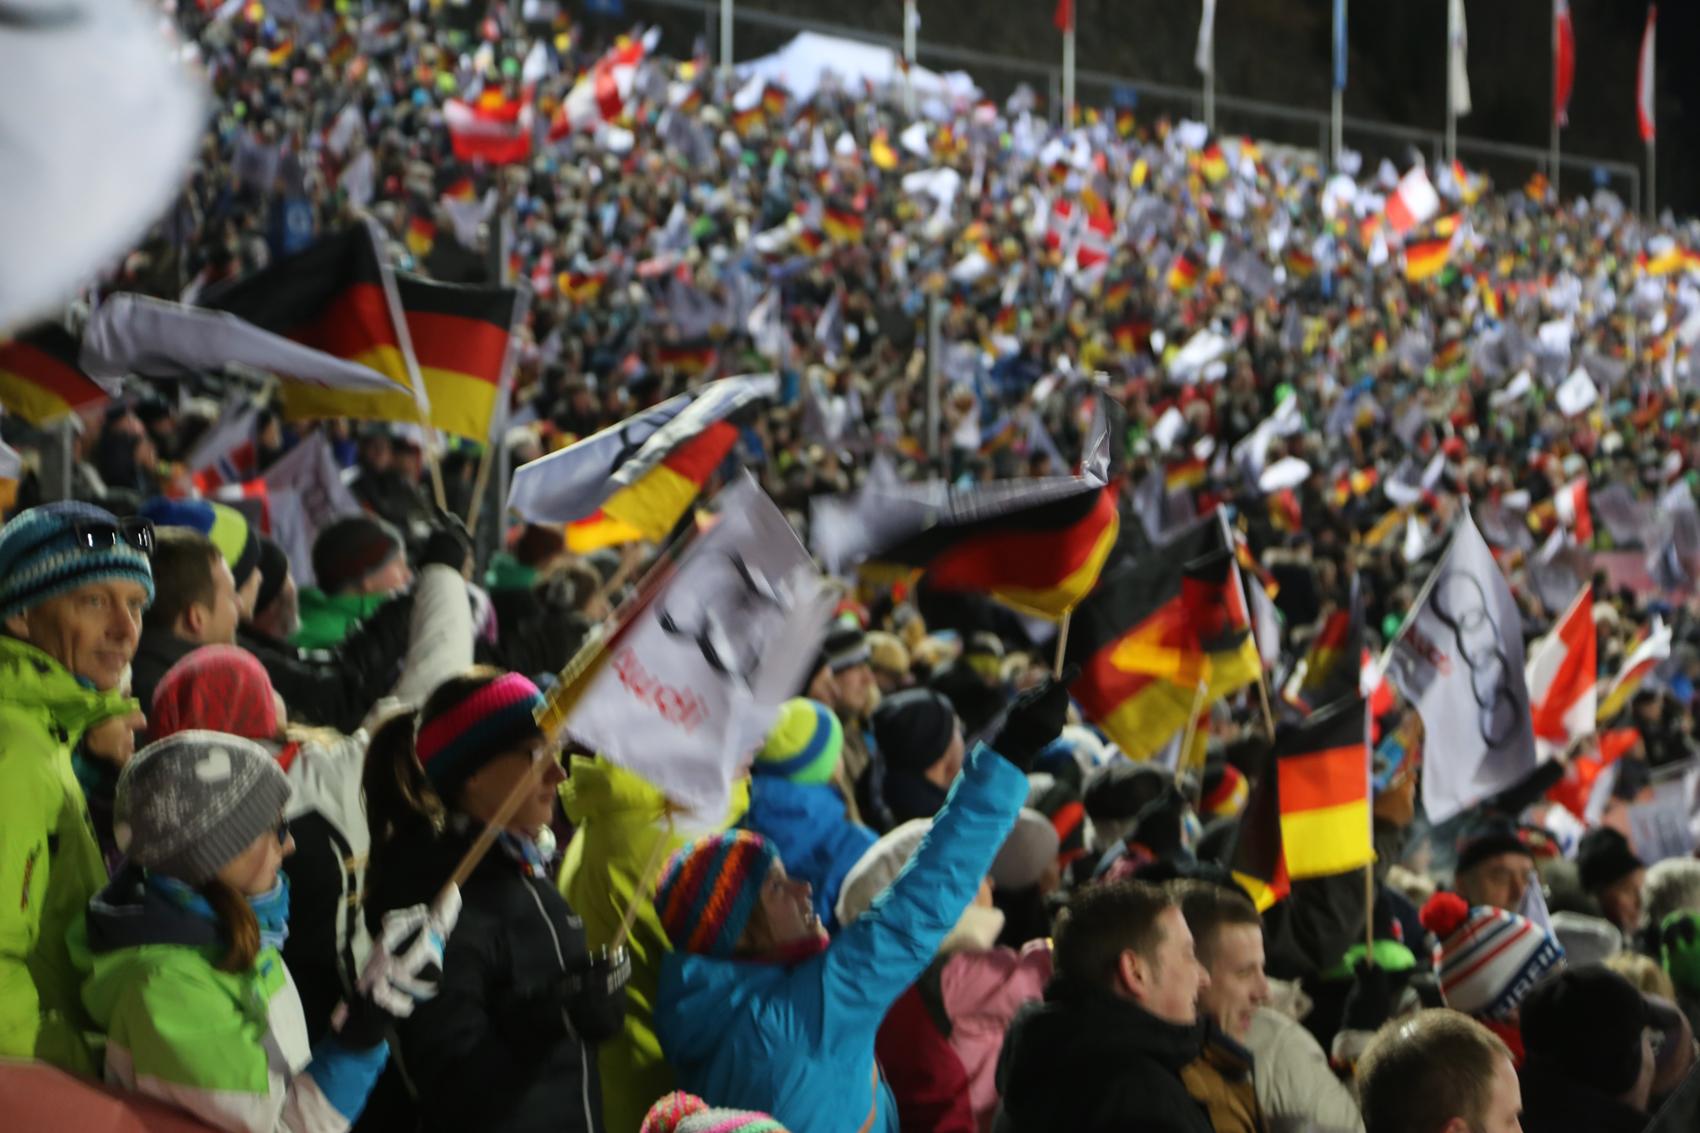 29-12-2015_Oberstdorf_Vierschanzentournee_Poeppel_new-facts-eu0046